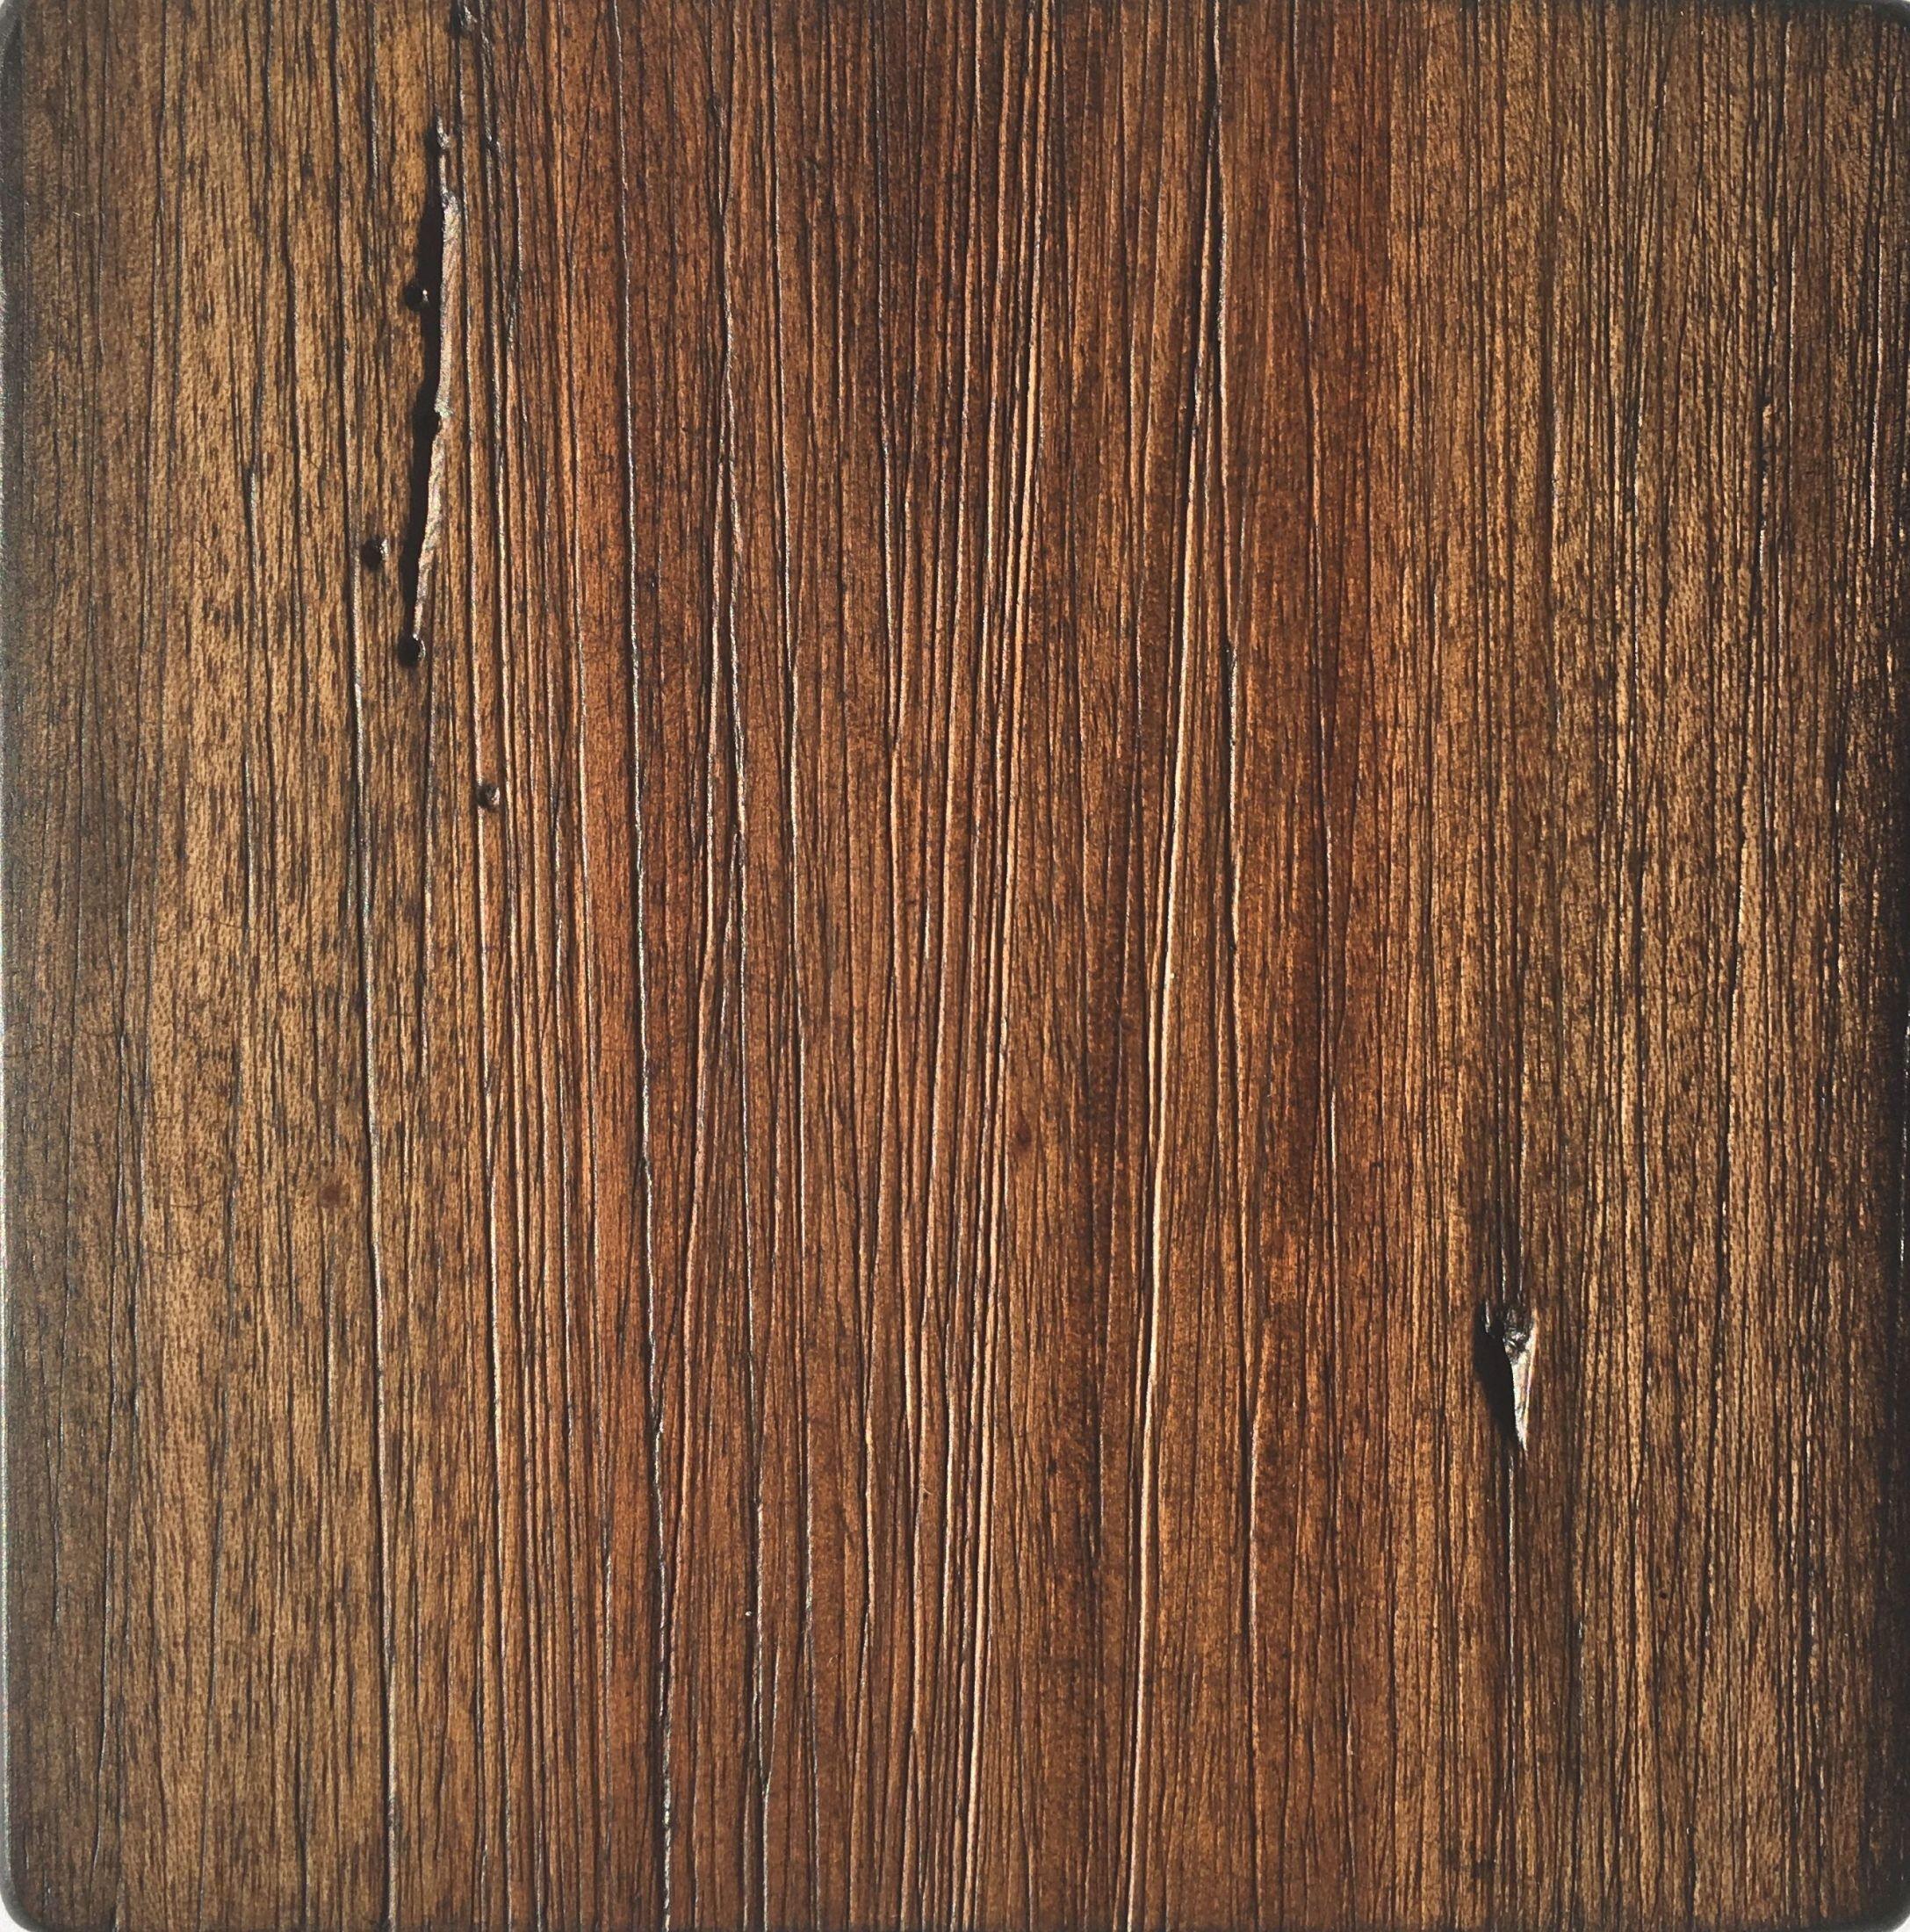 anacortes mahogany kitchen island anasm9080 a america